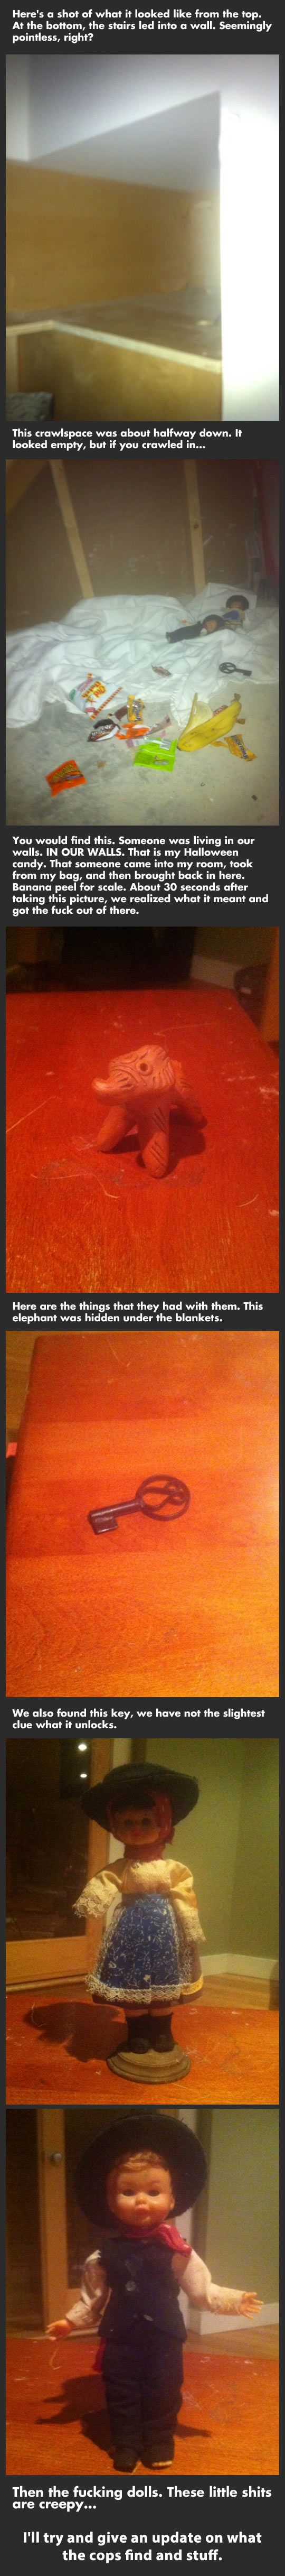 399 best scary facts images on Pinterest | Creepy stuff, Random ...